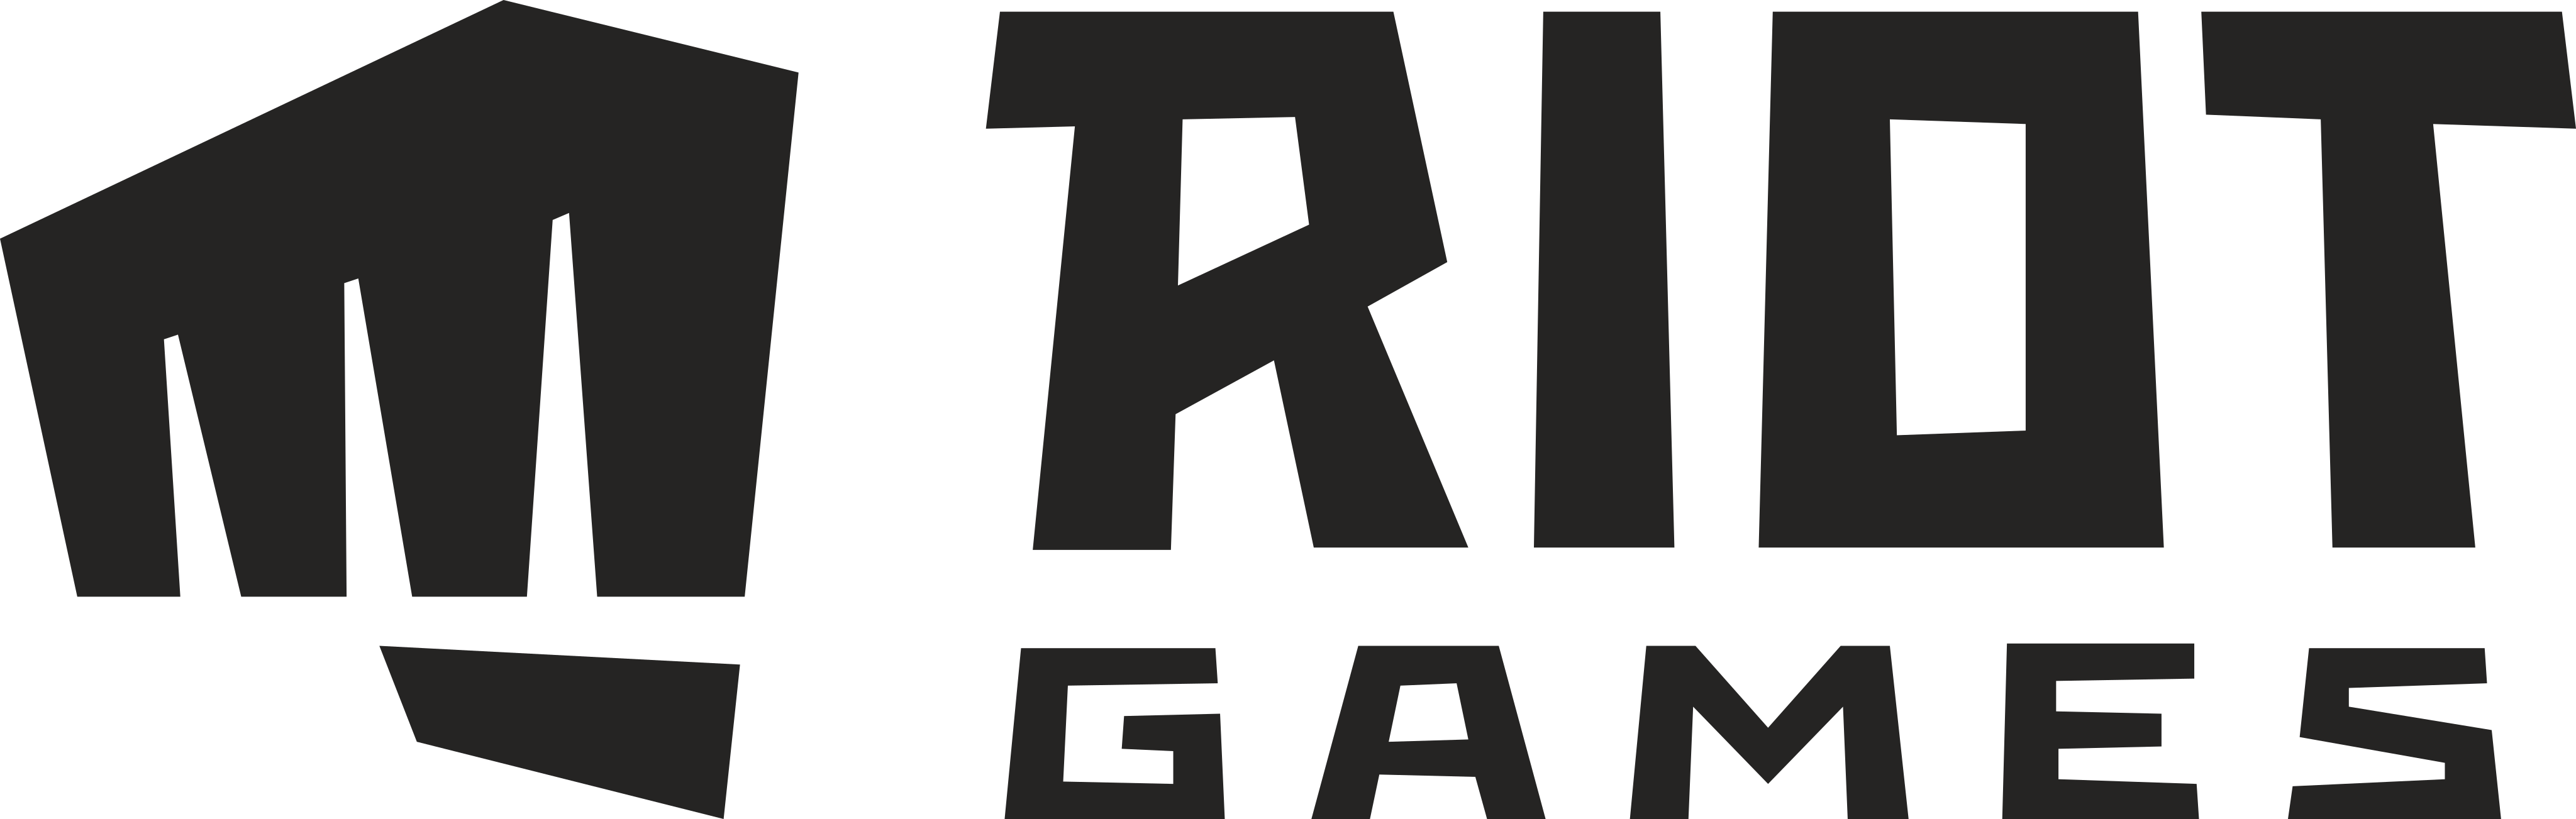 riot games logo 1 - Riot Games Logo